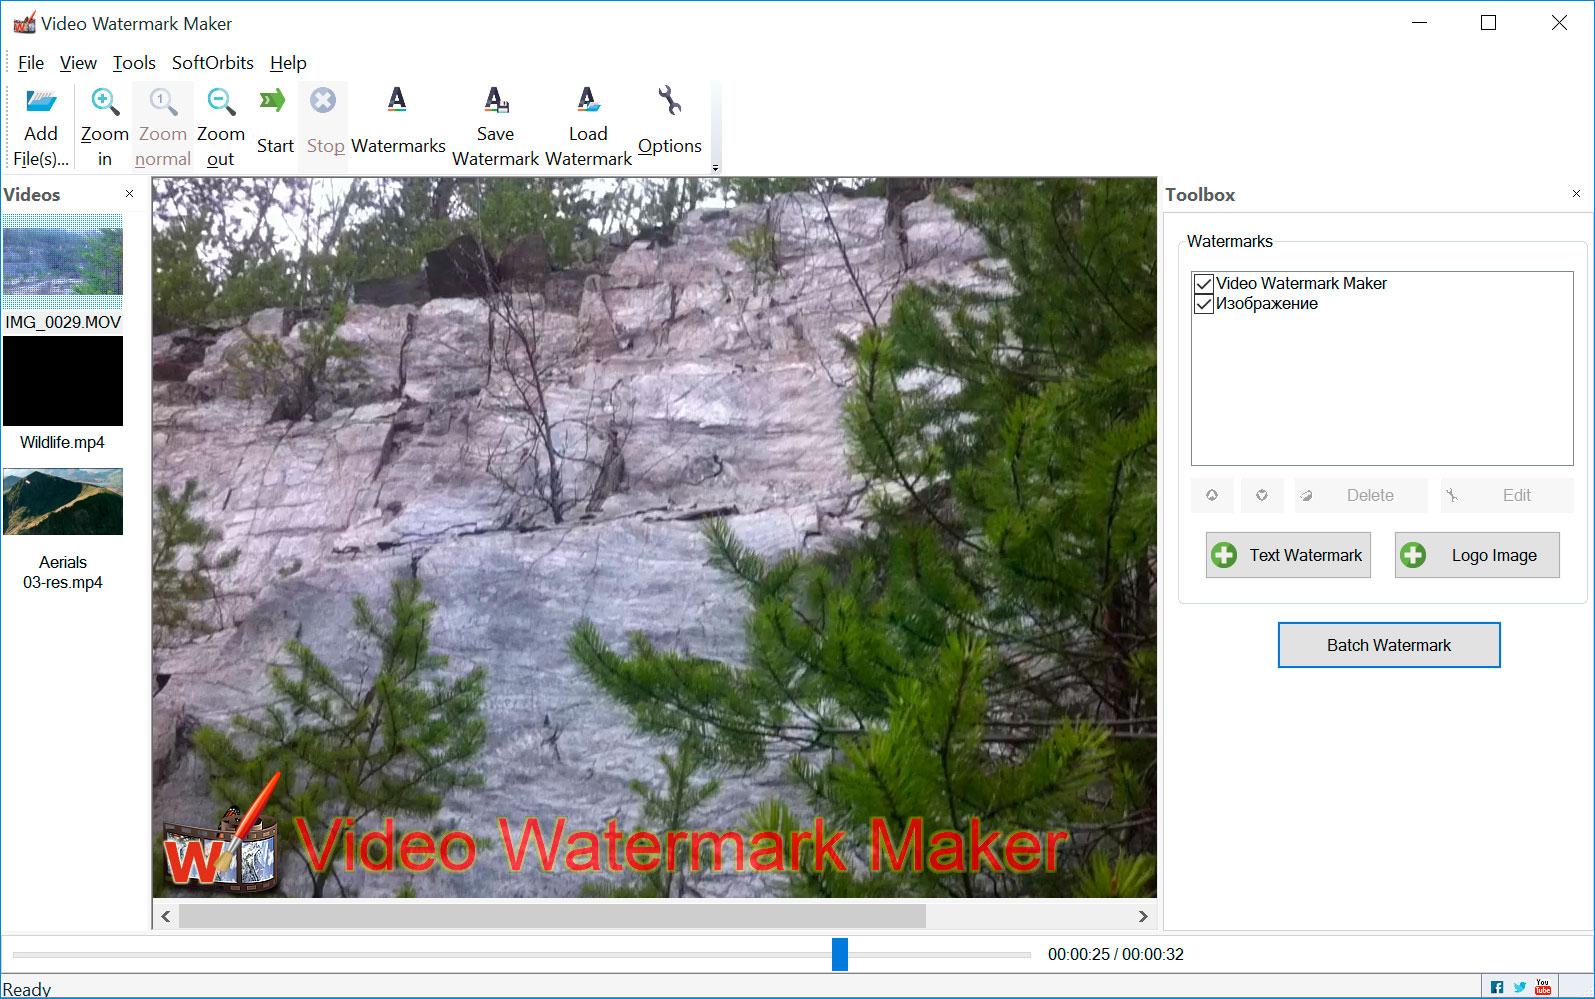 Video Watermark Maker صور من البرنامج